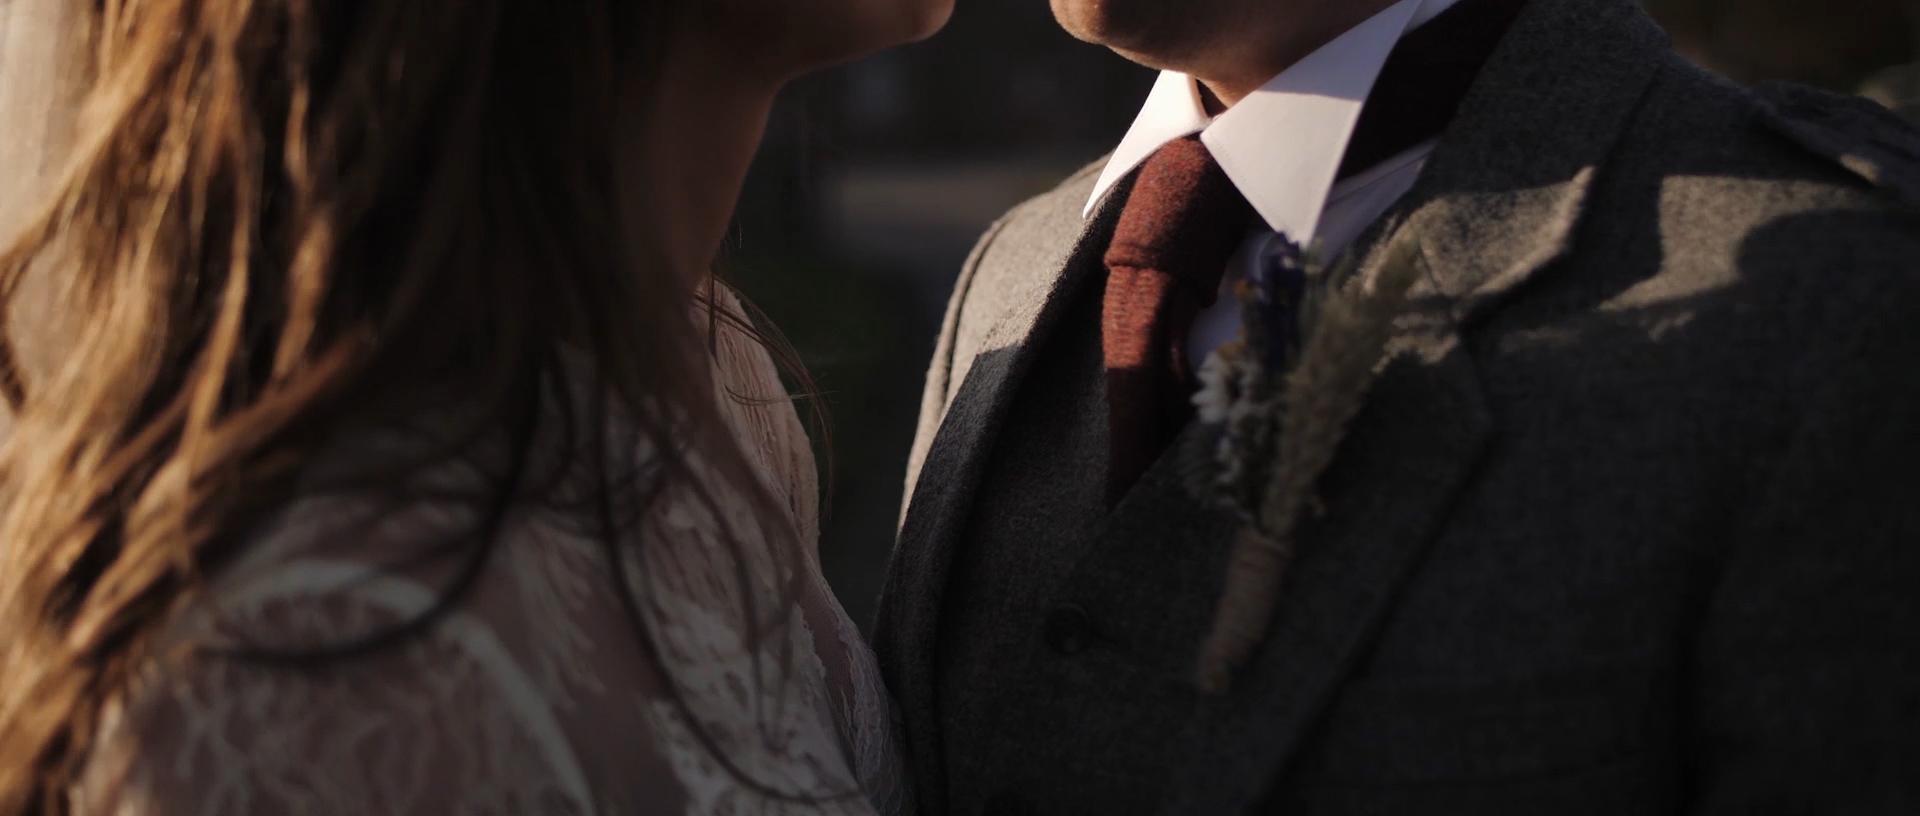 banchory-wedding-videographer_LL_04.jpg